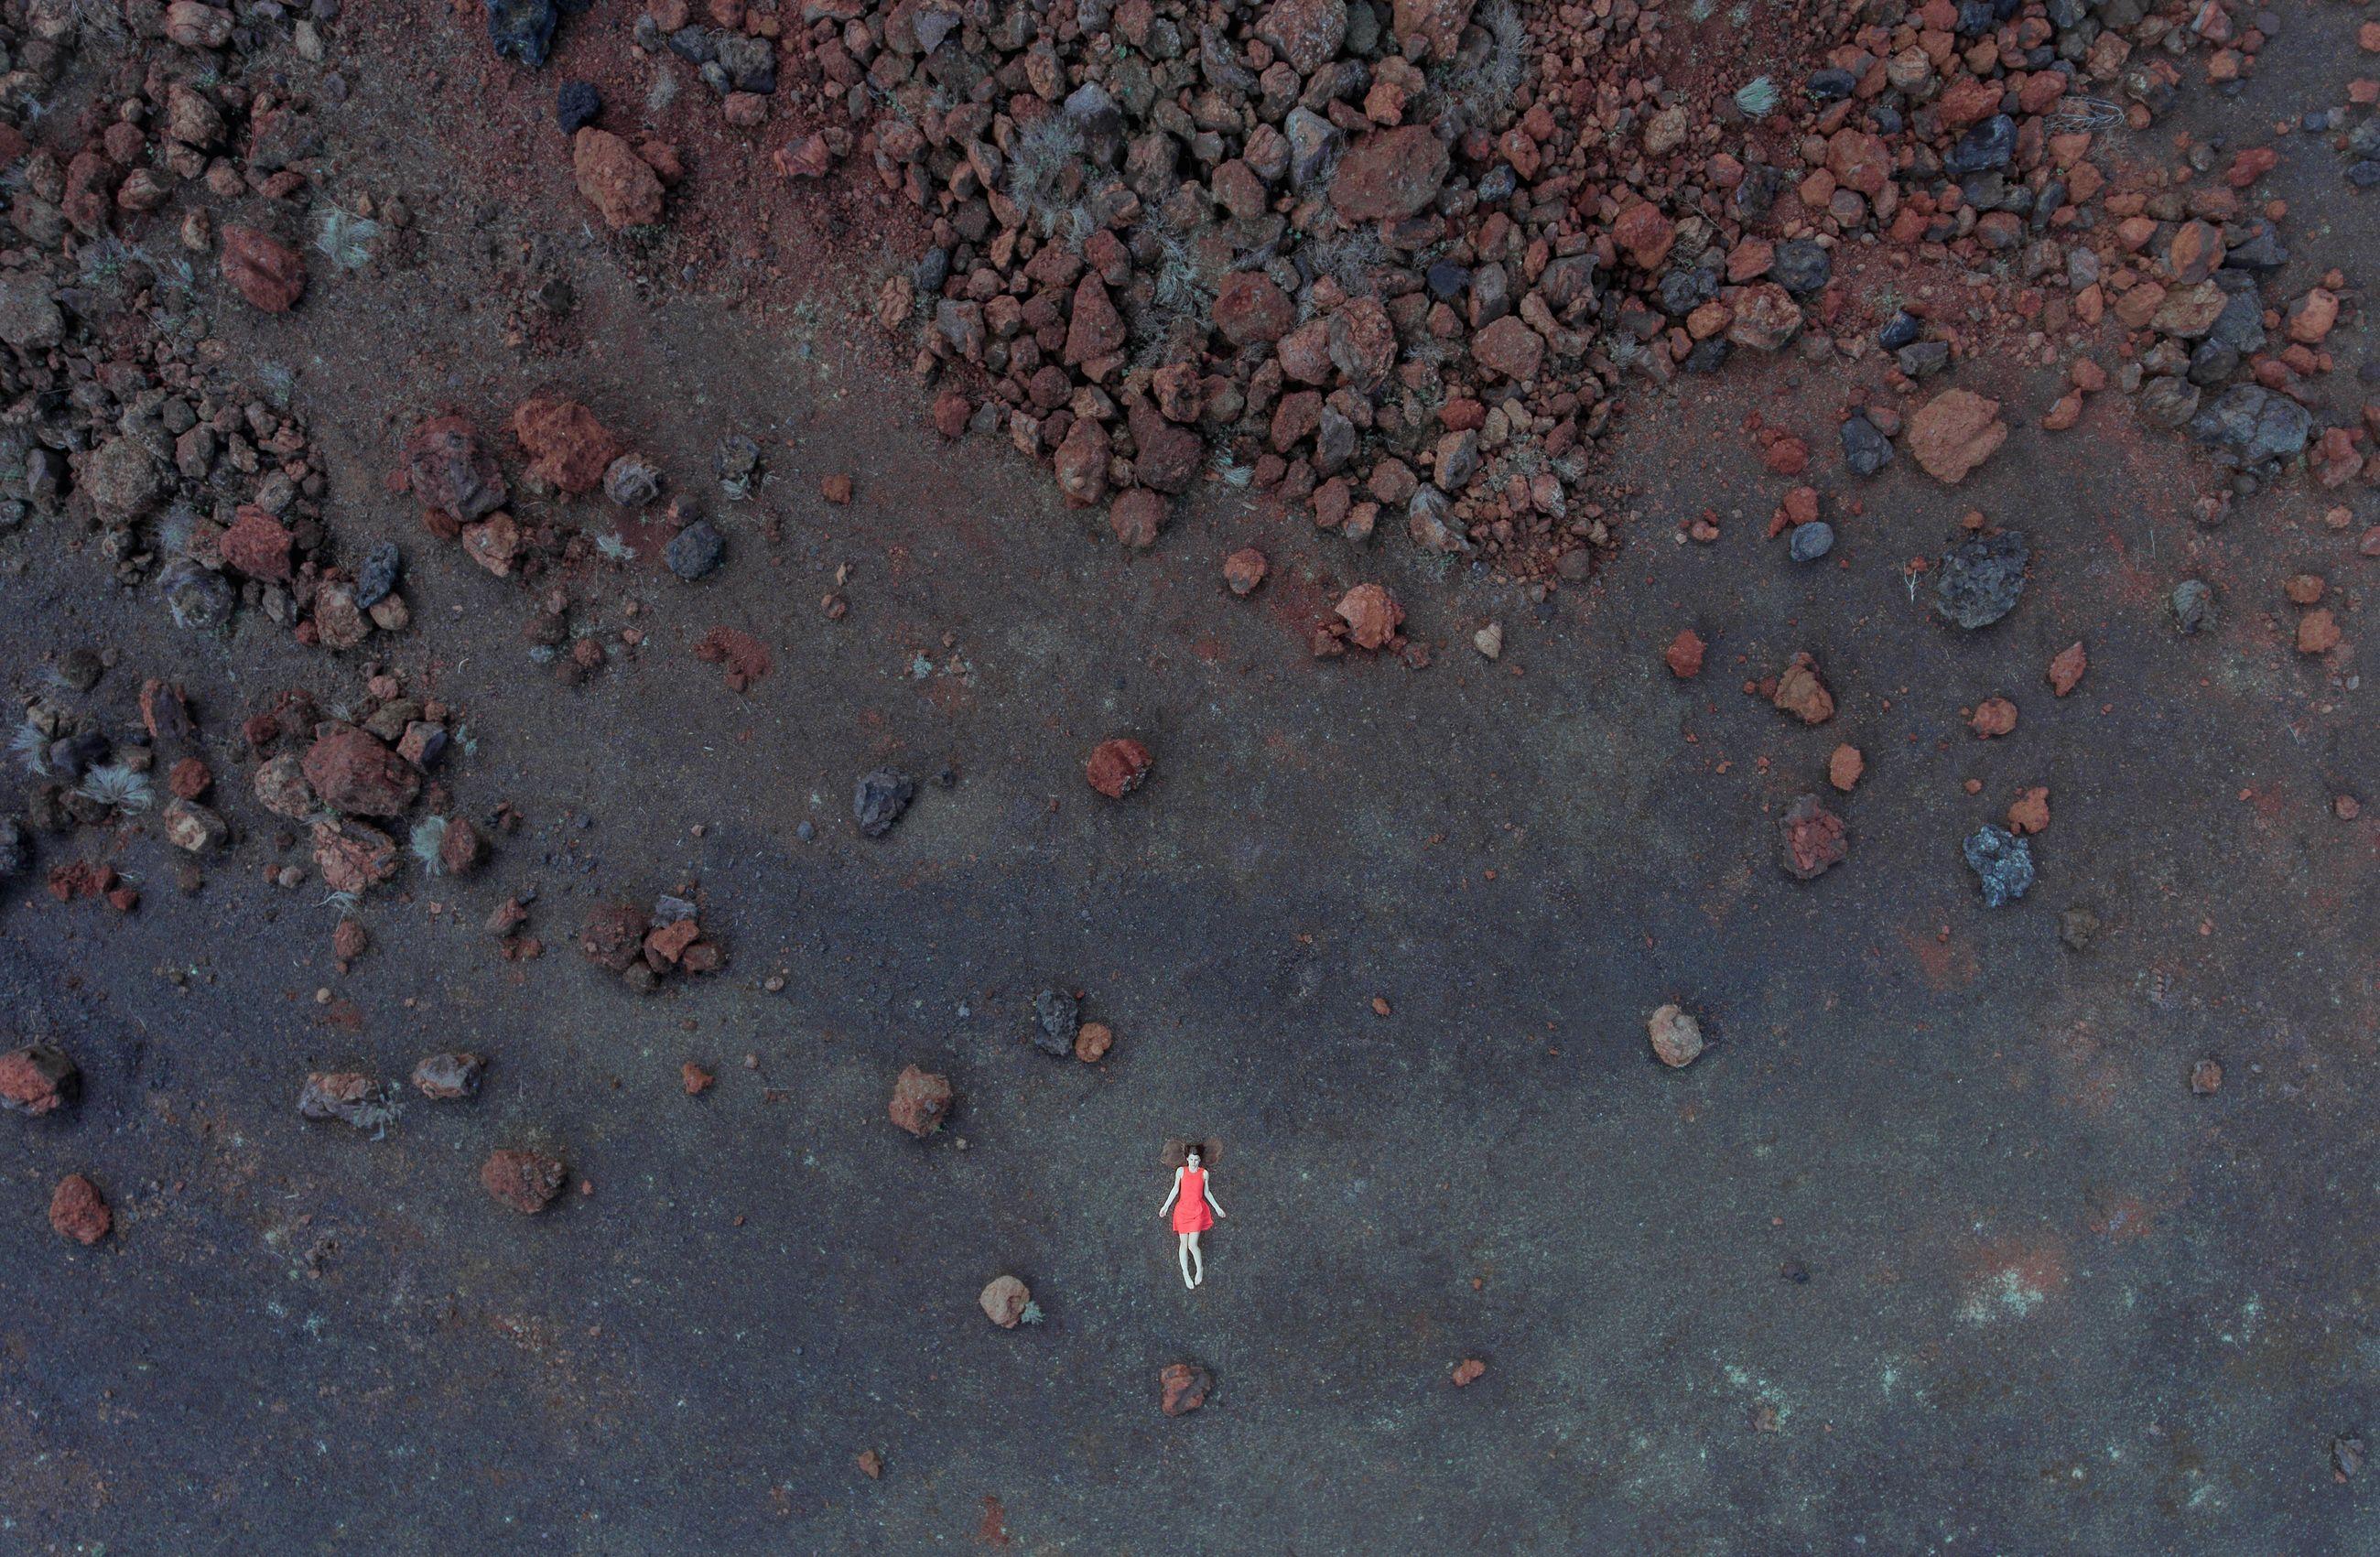 HIGH ANGLE VIEW OF WOMAN STANDING ON SAND